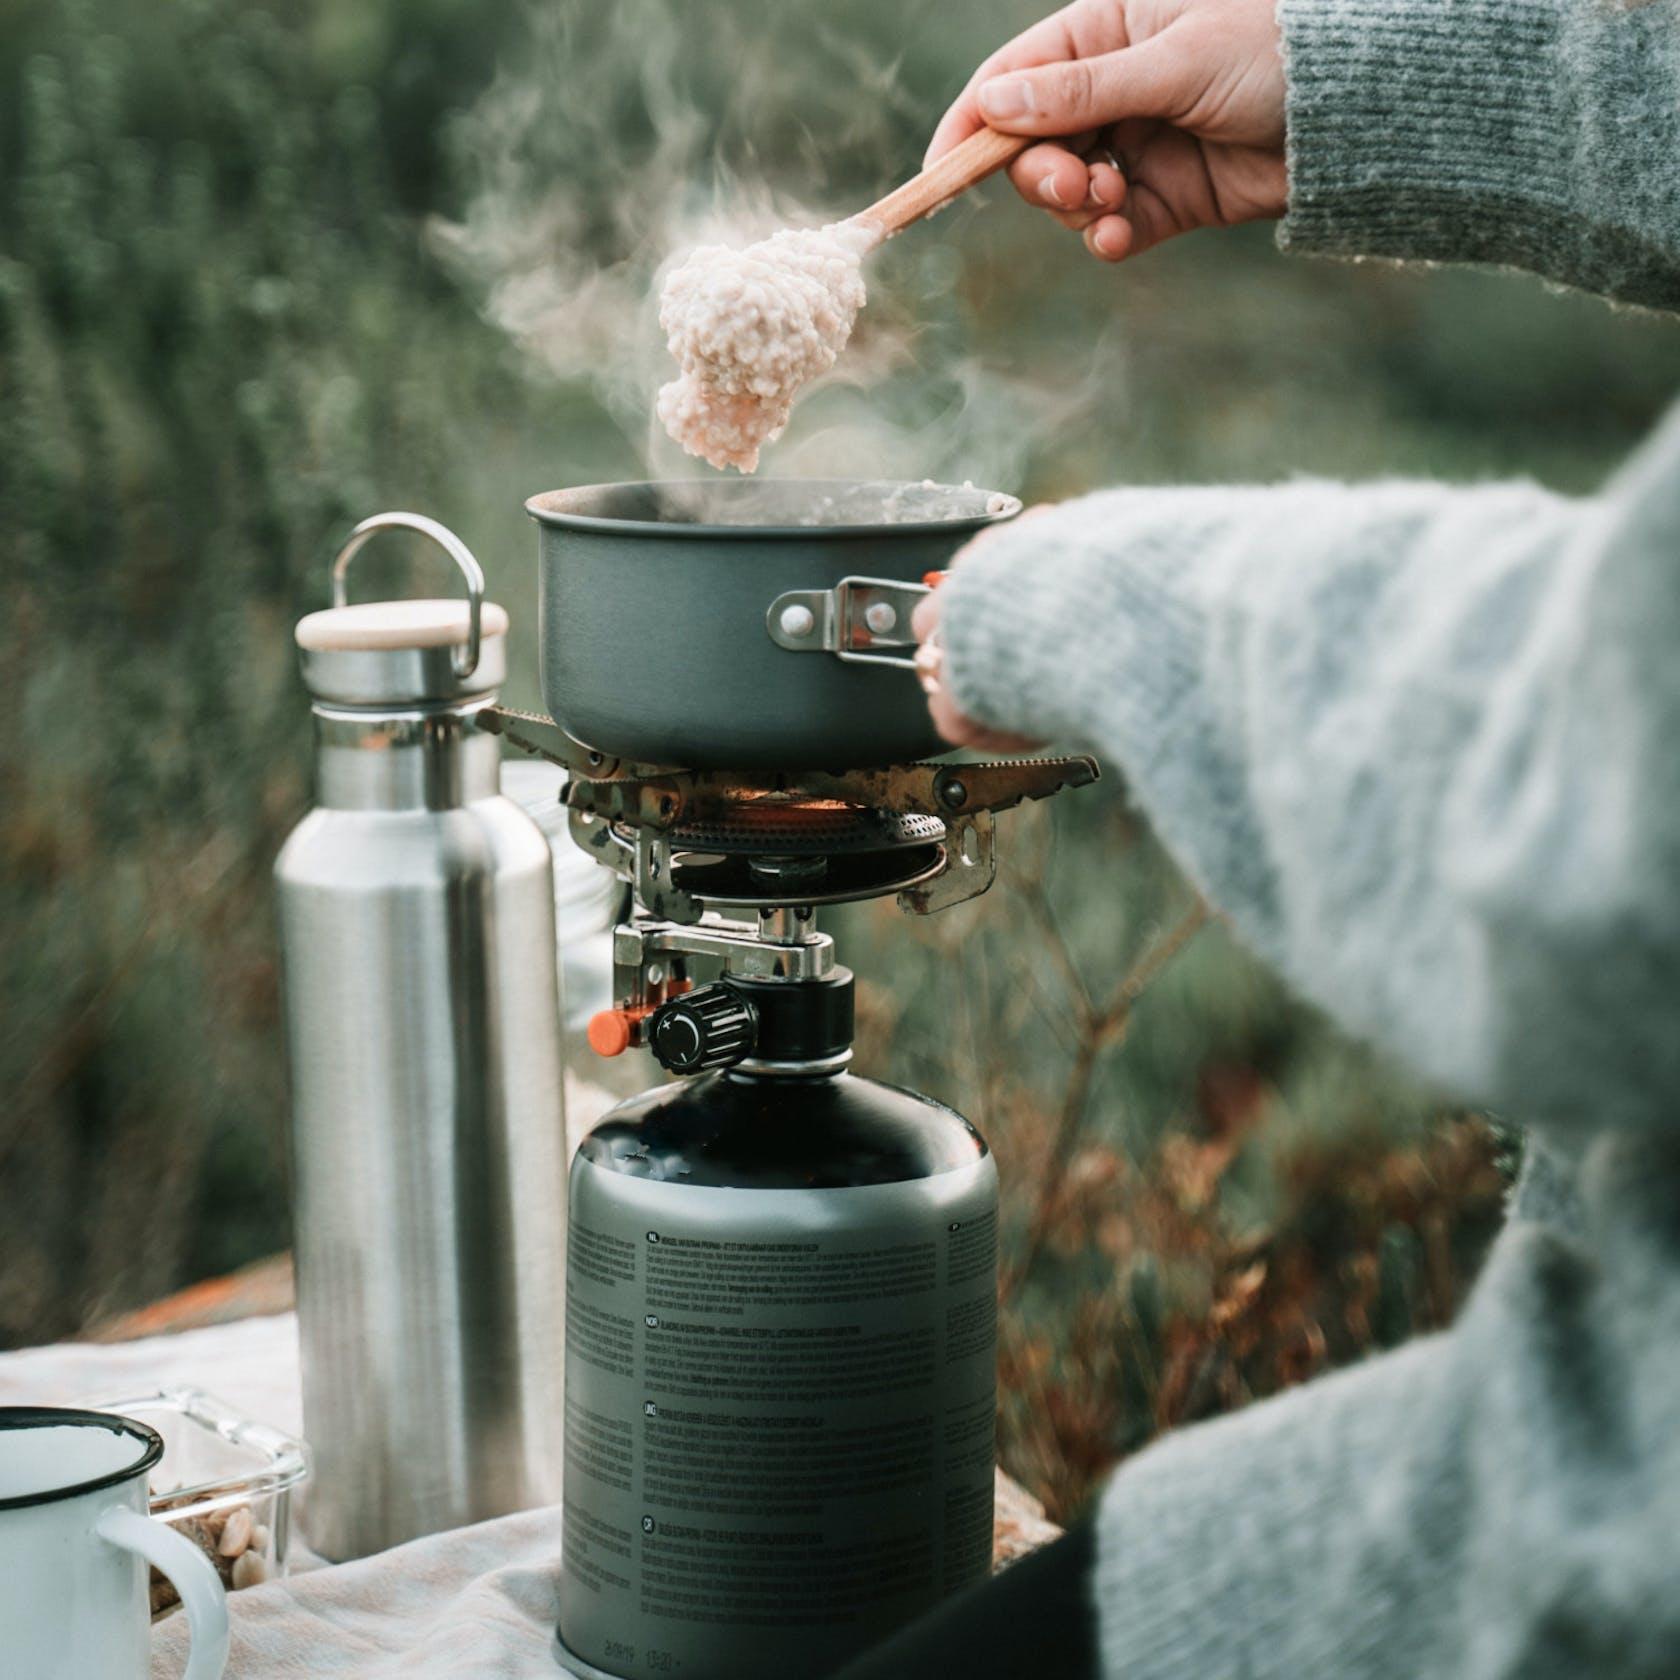 Attrezzatura cucina outdoor